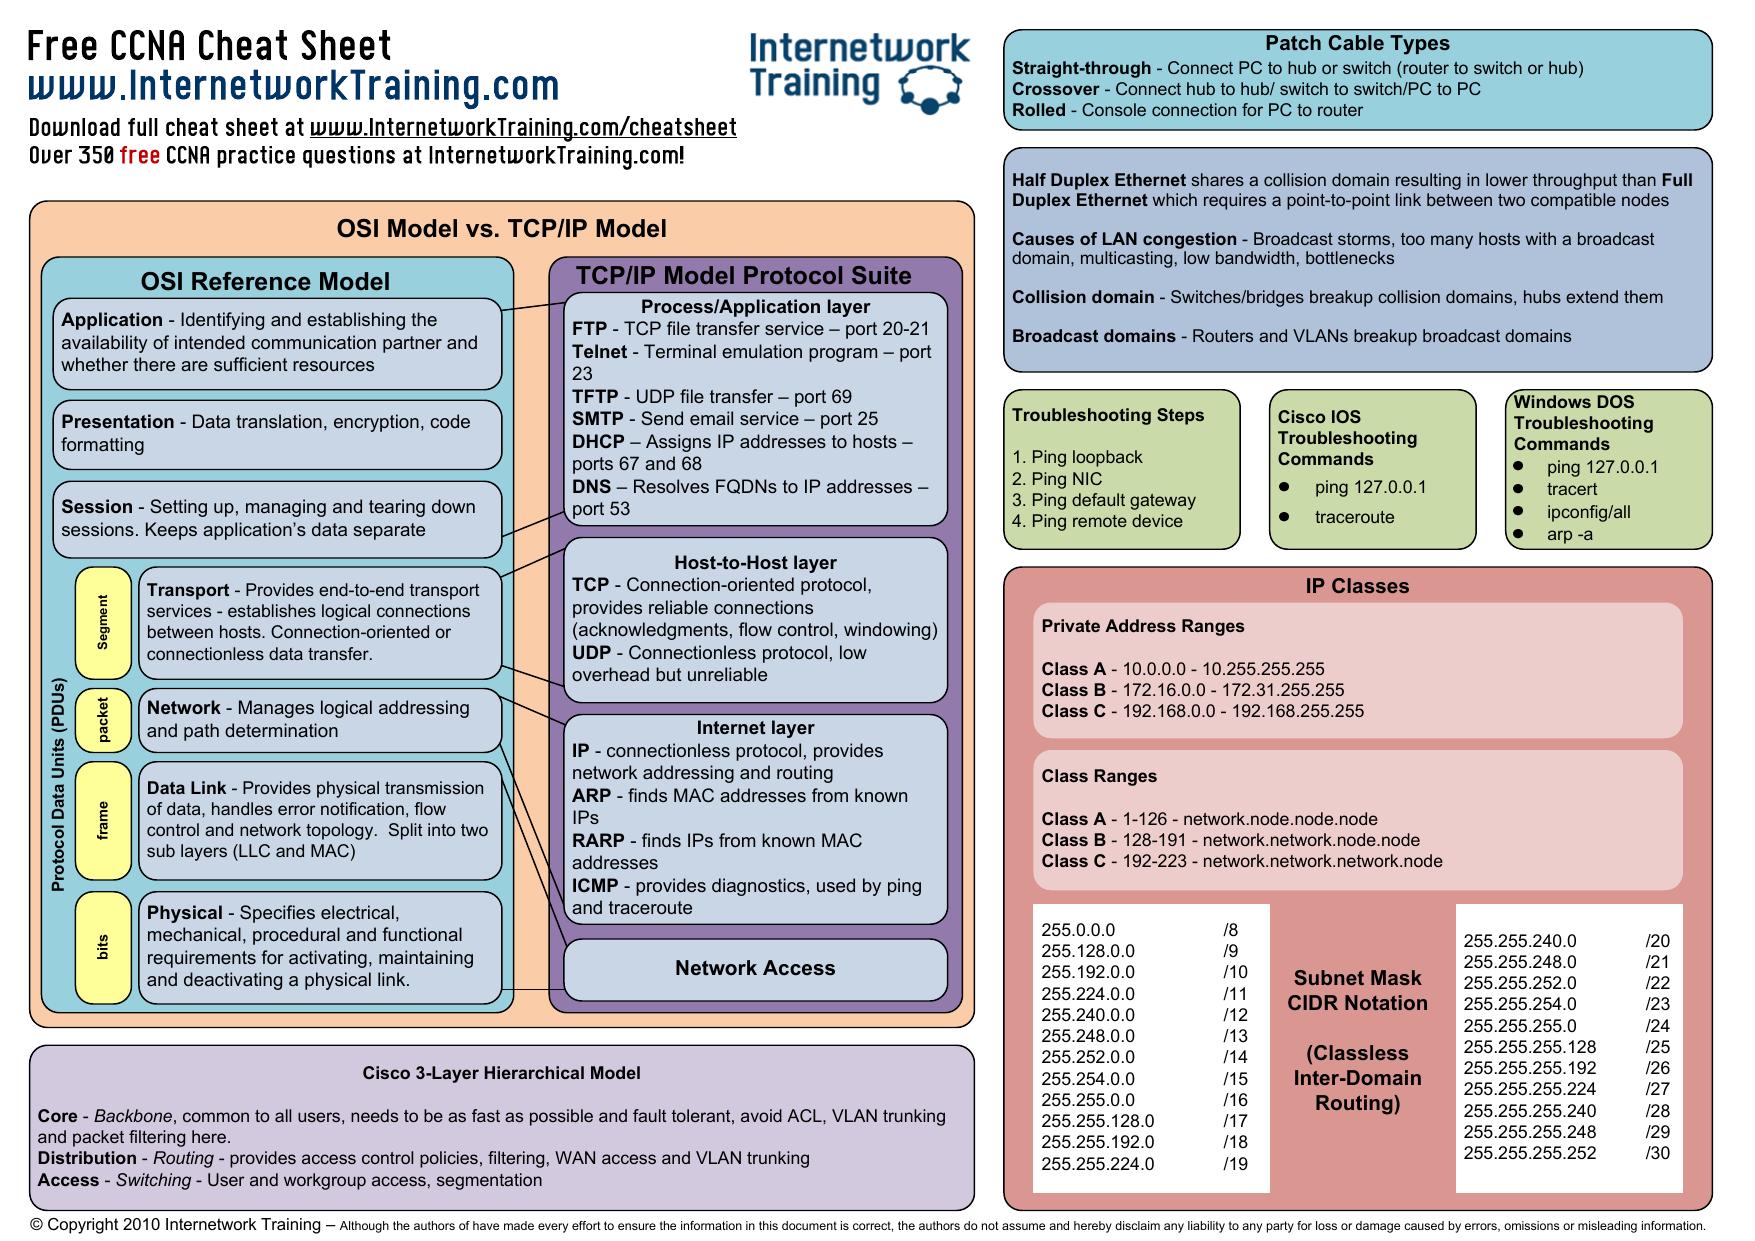 CCNA cheat sheet - Internetwork Training